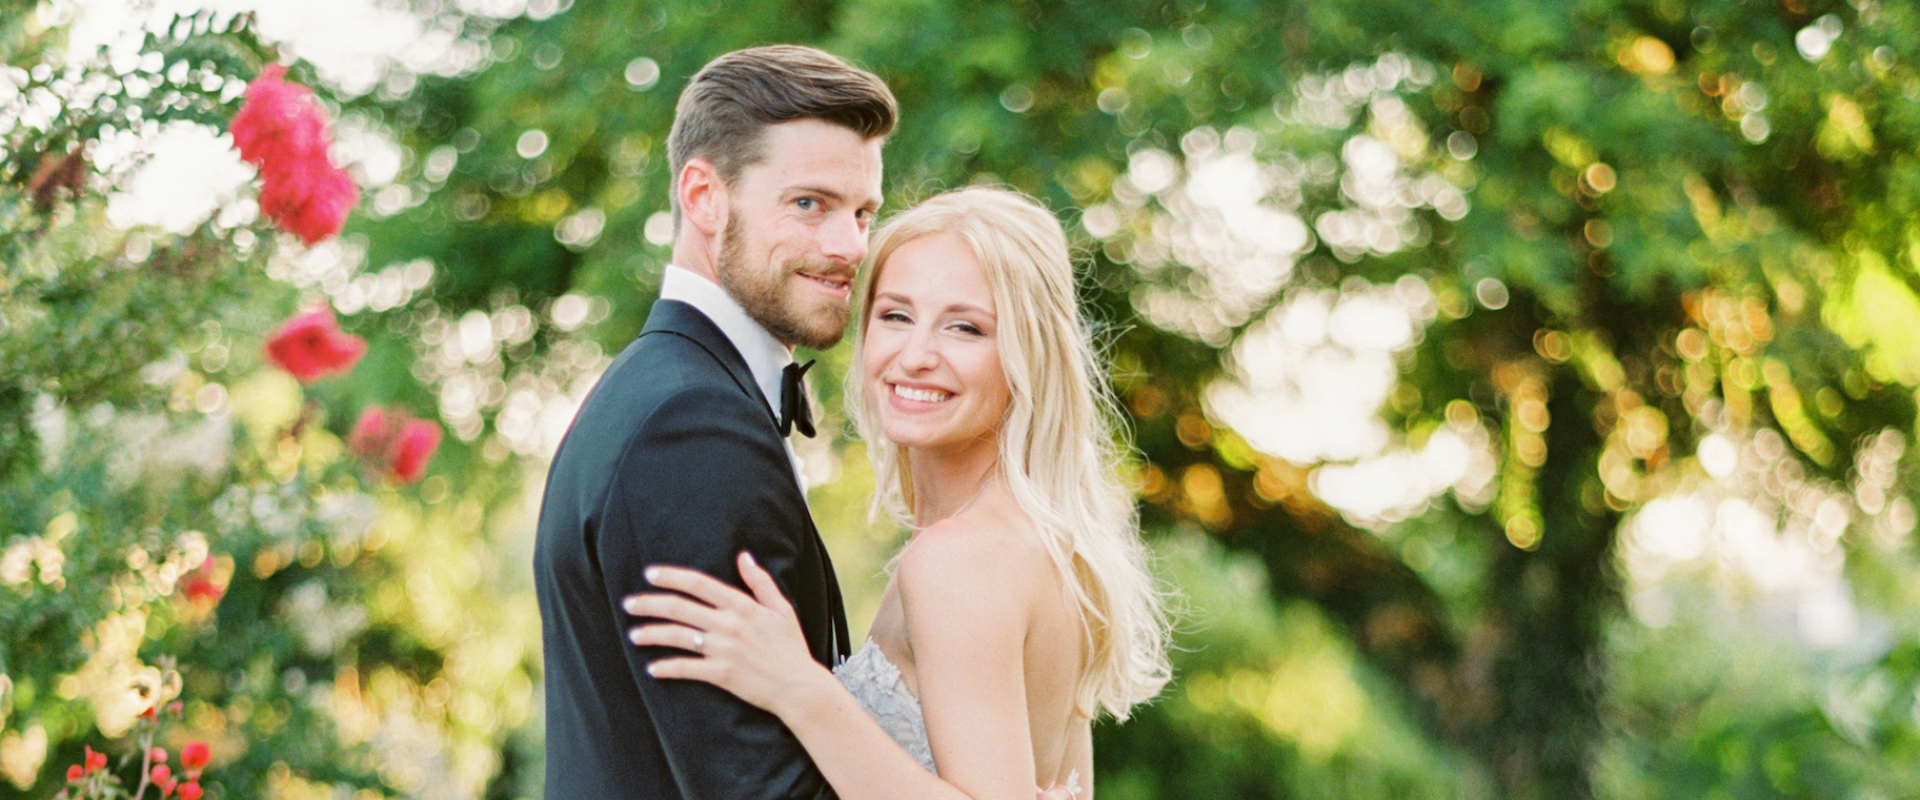 Newlyweds in Garden